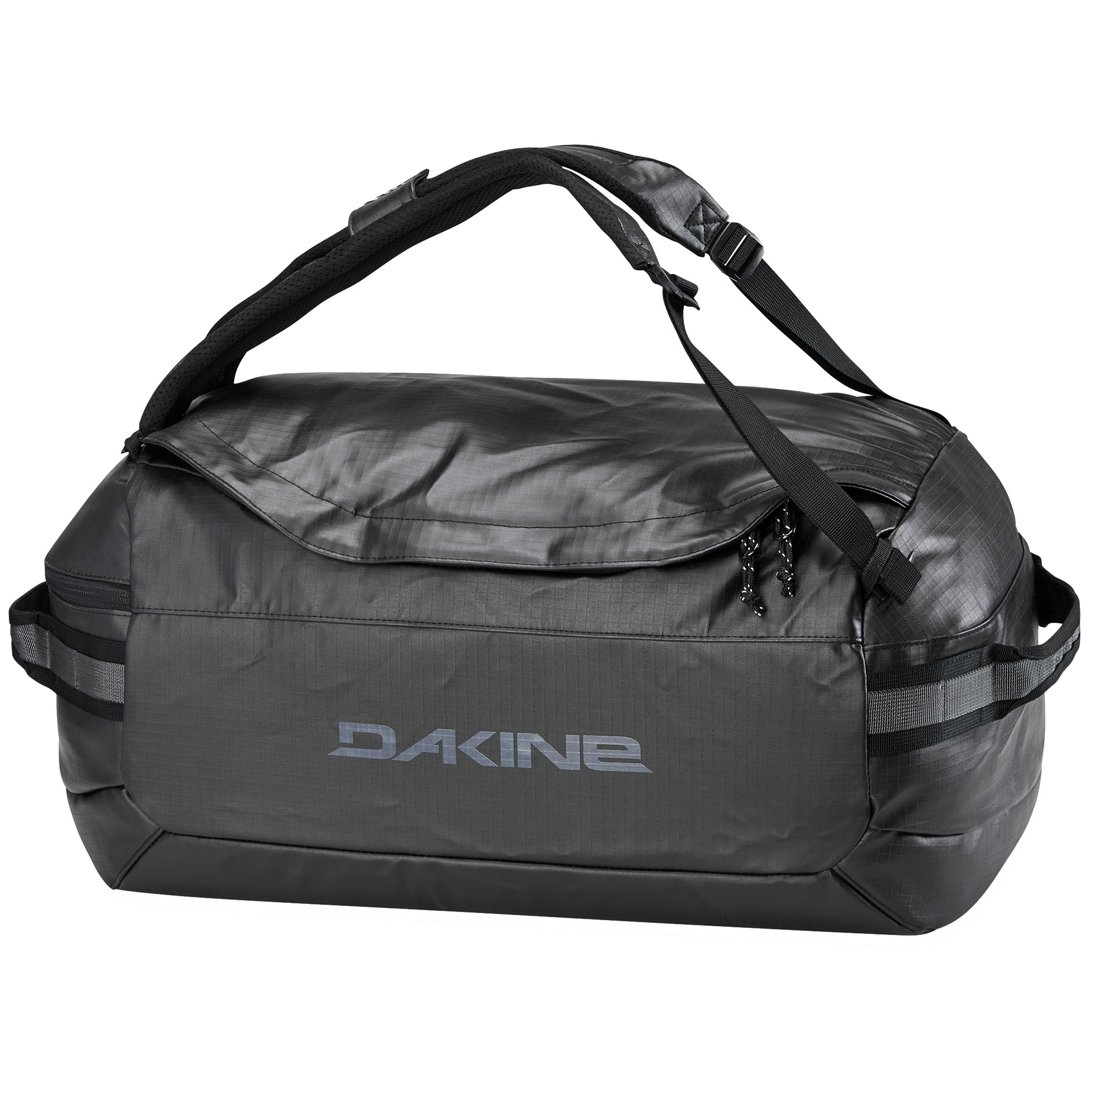 d1570c366b7b8 Dakine Packs   Bags Ranger Reisetasche 61 cm - koffer-direkt.de